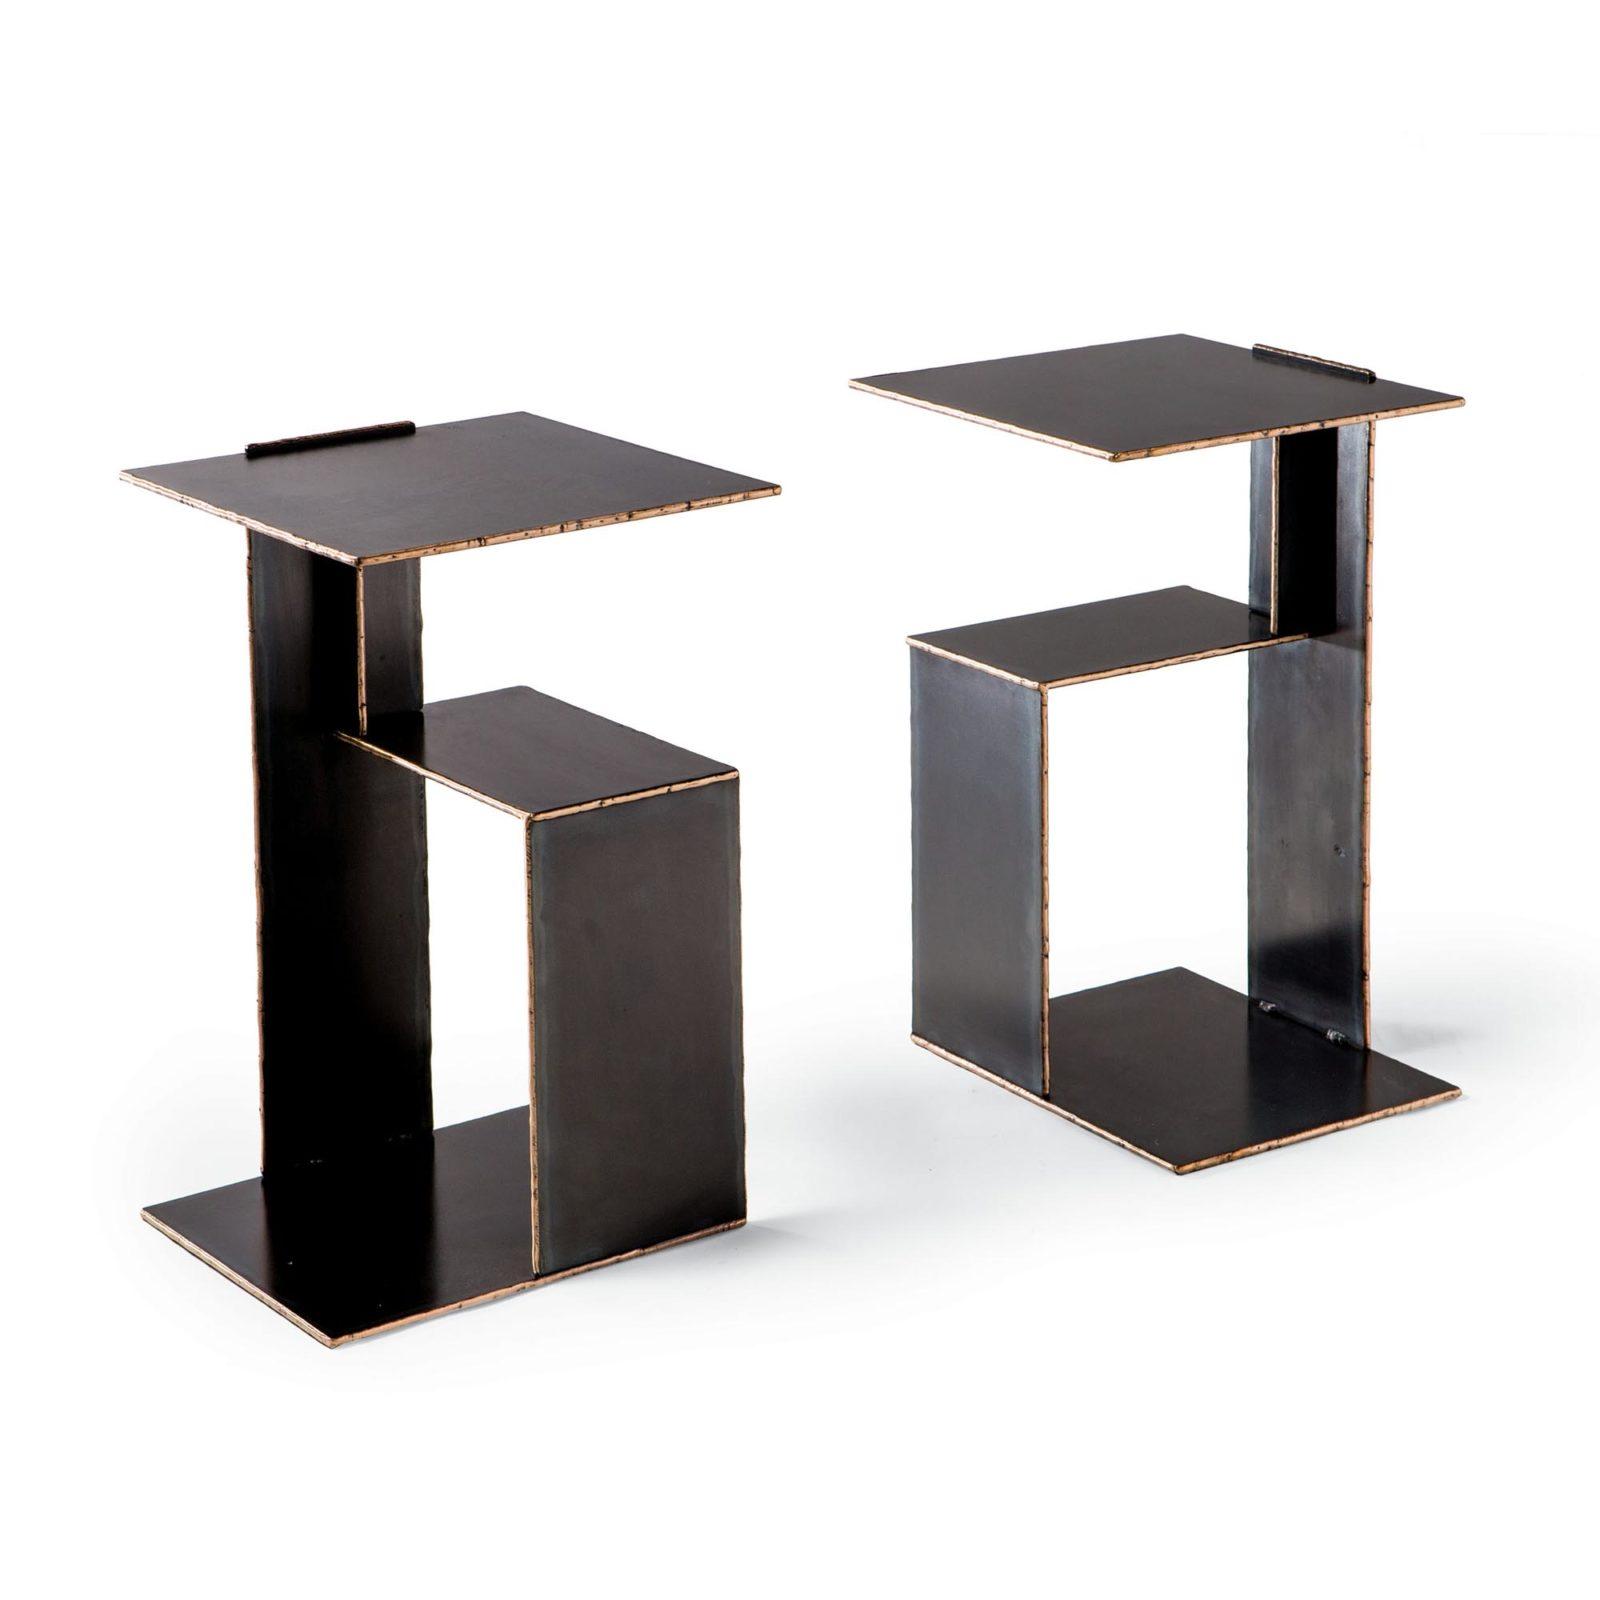 tuell & reynolds asilomar accent table